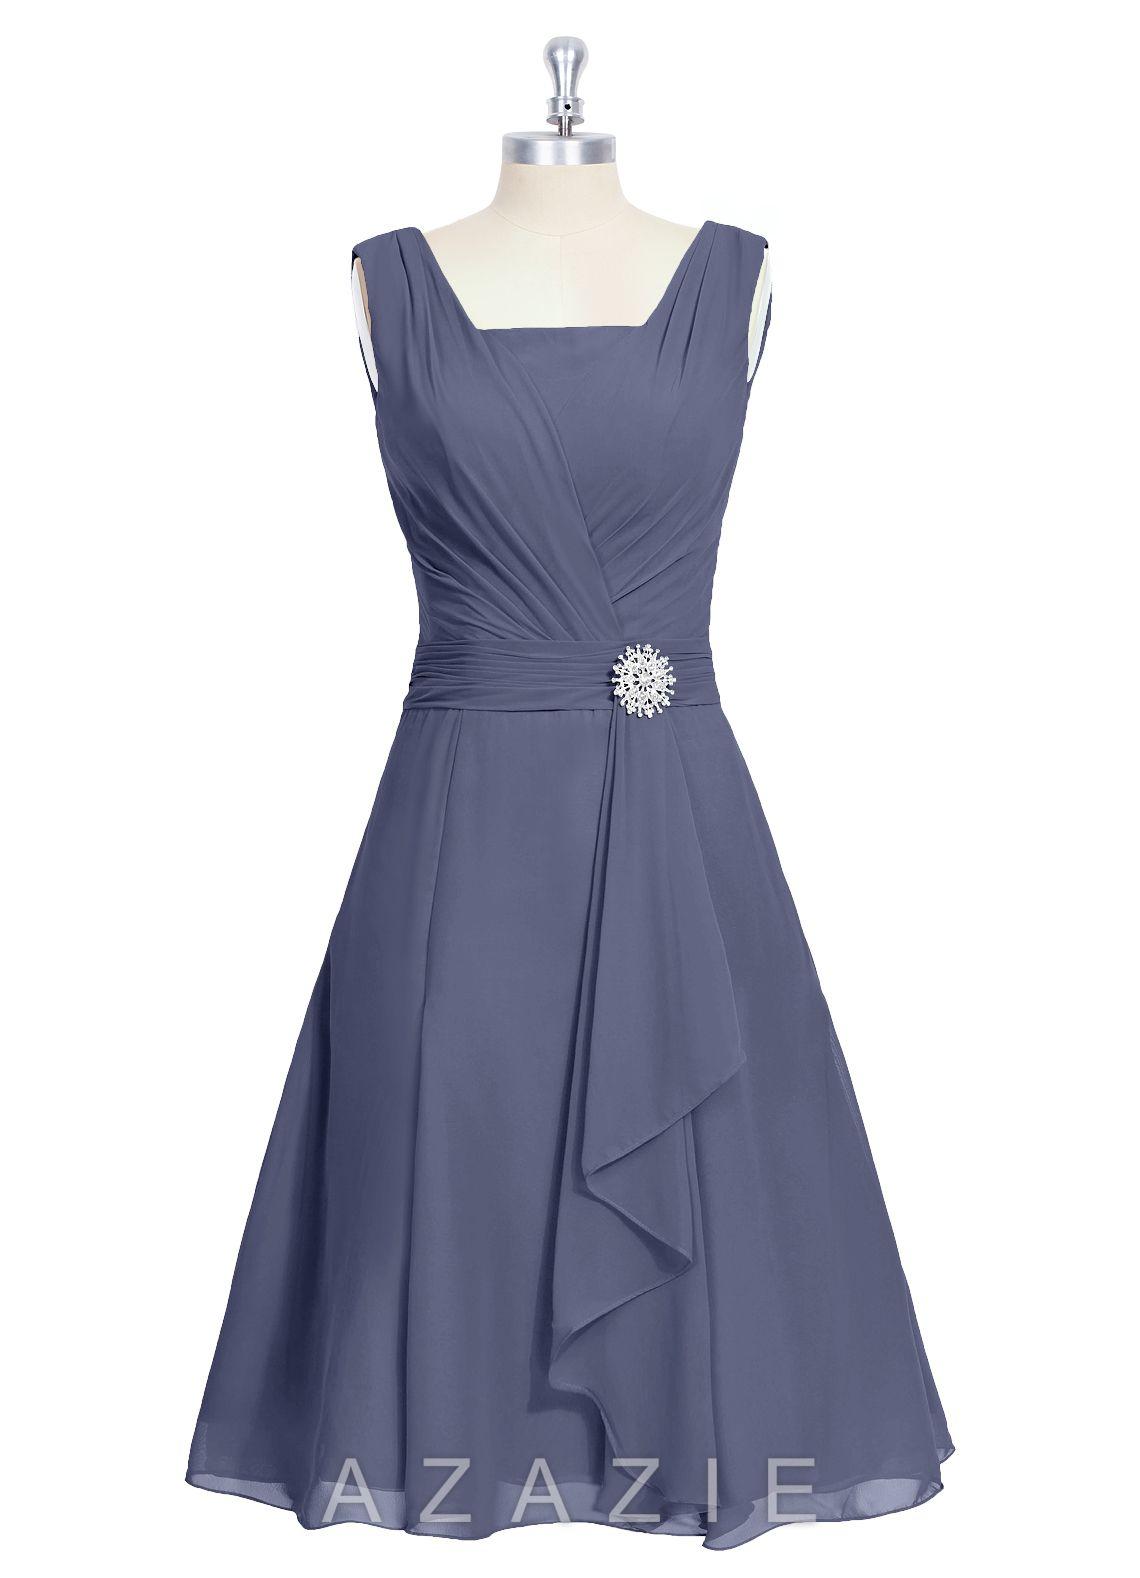 Dresses to wear to a destination wedding as a guest  SAVANNAH  Bridesmaid Dress  Chiffon bridesmaid dresses chats